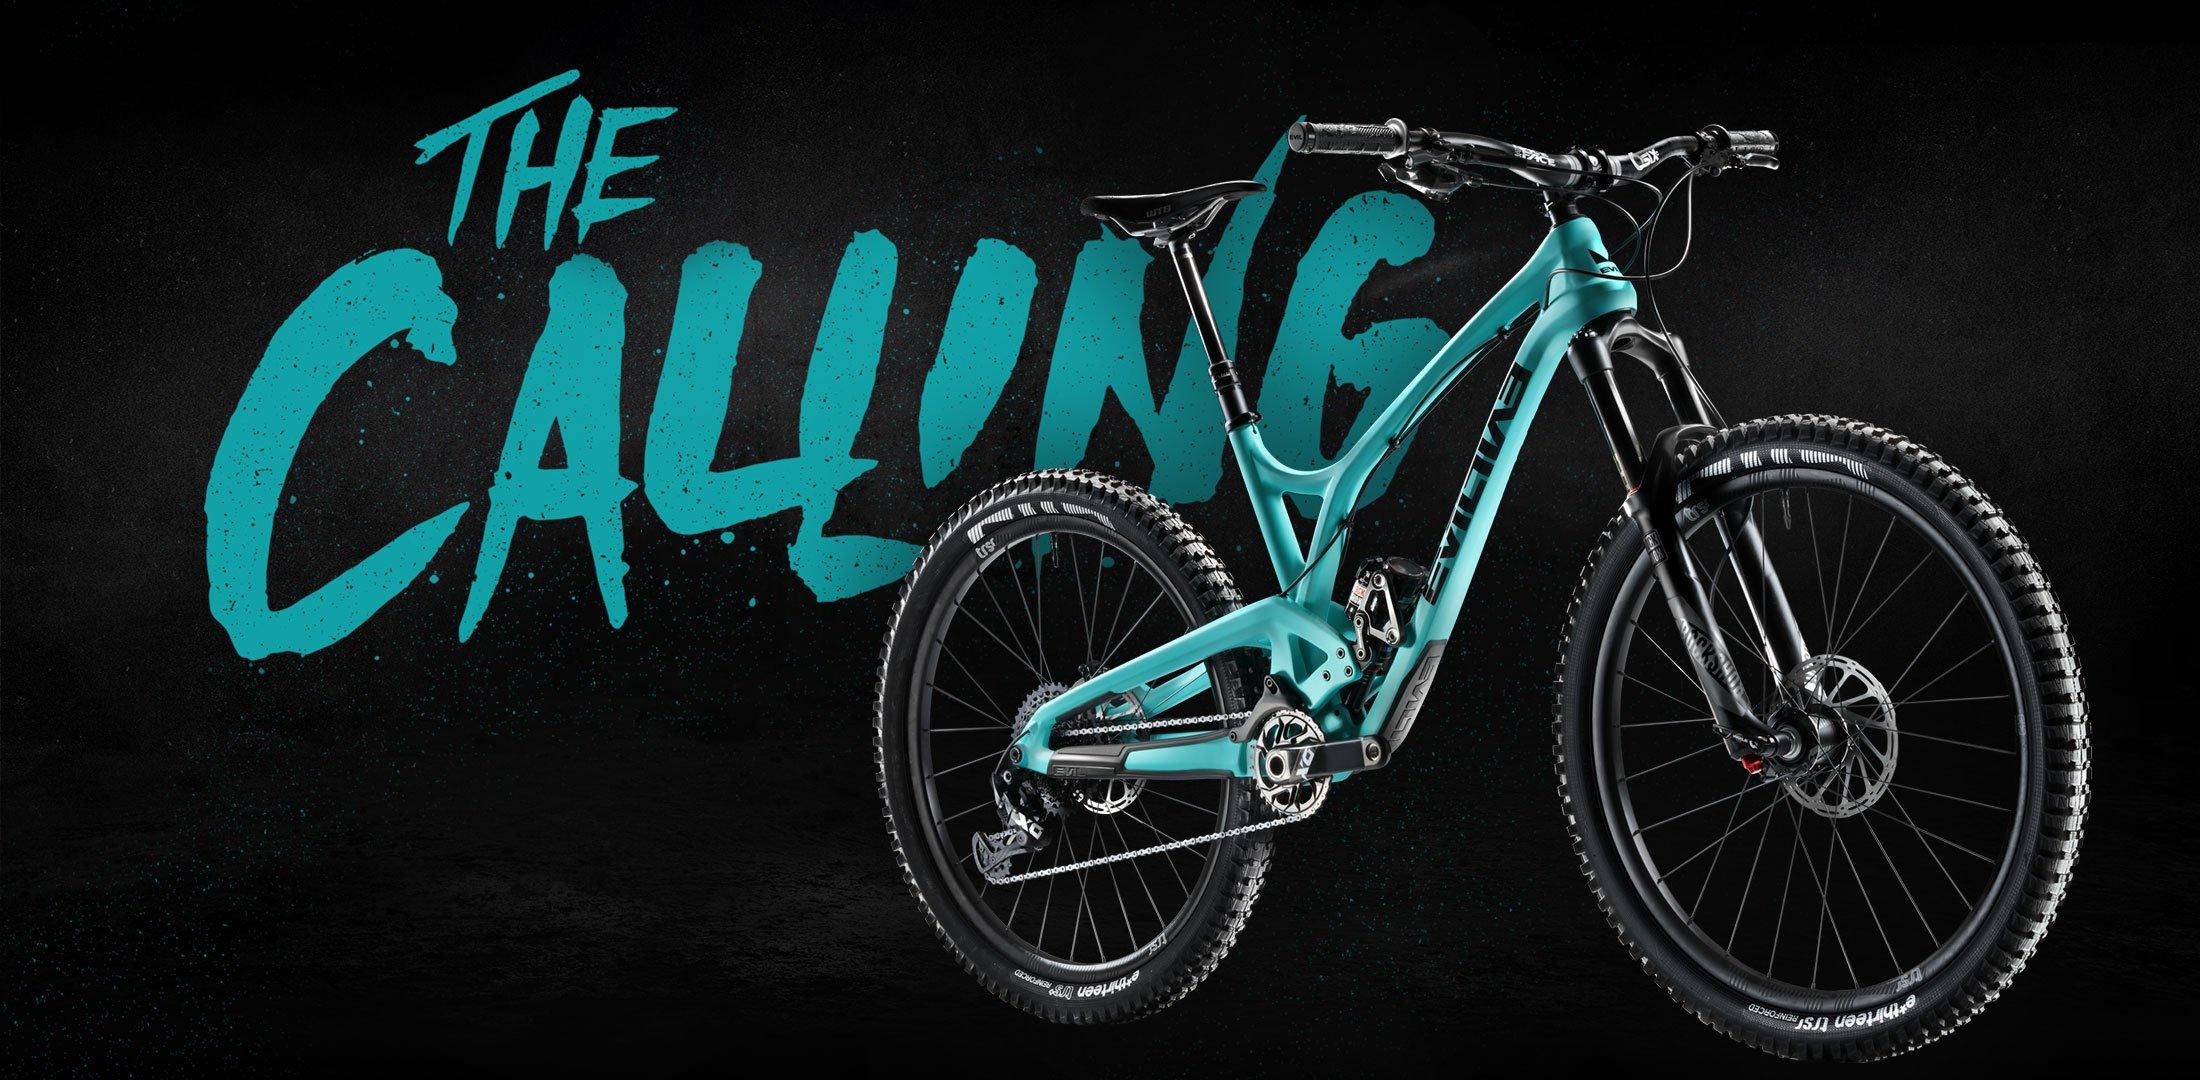 evil-calling-bike-hero-2200x1080.jpg